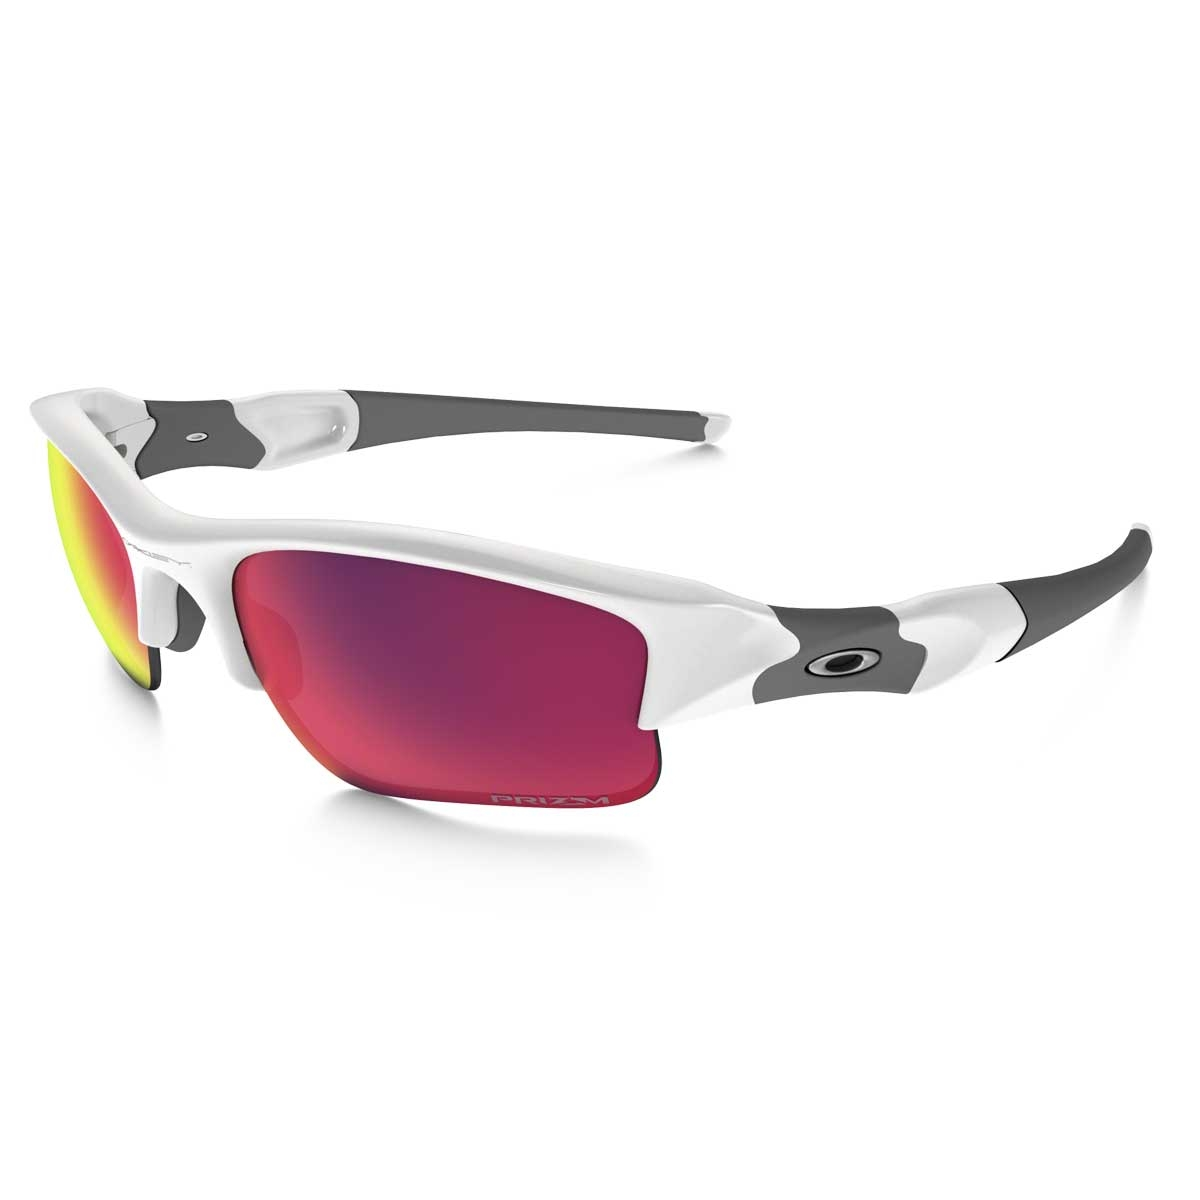 bd1e2f7126 Image of Oakley Flak Jacket XLJ Men s Polarized Sunglasses - Polished White    Prizm Road